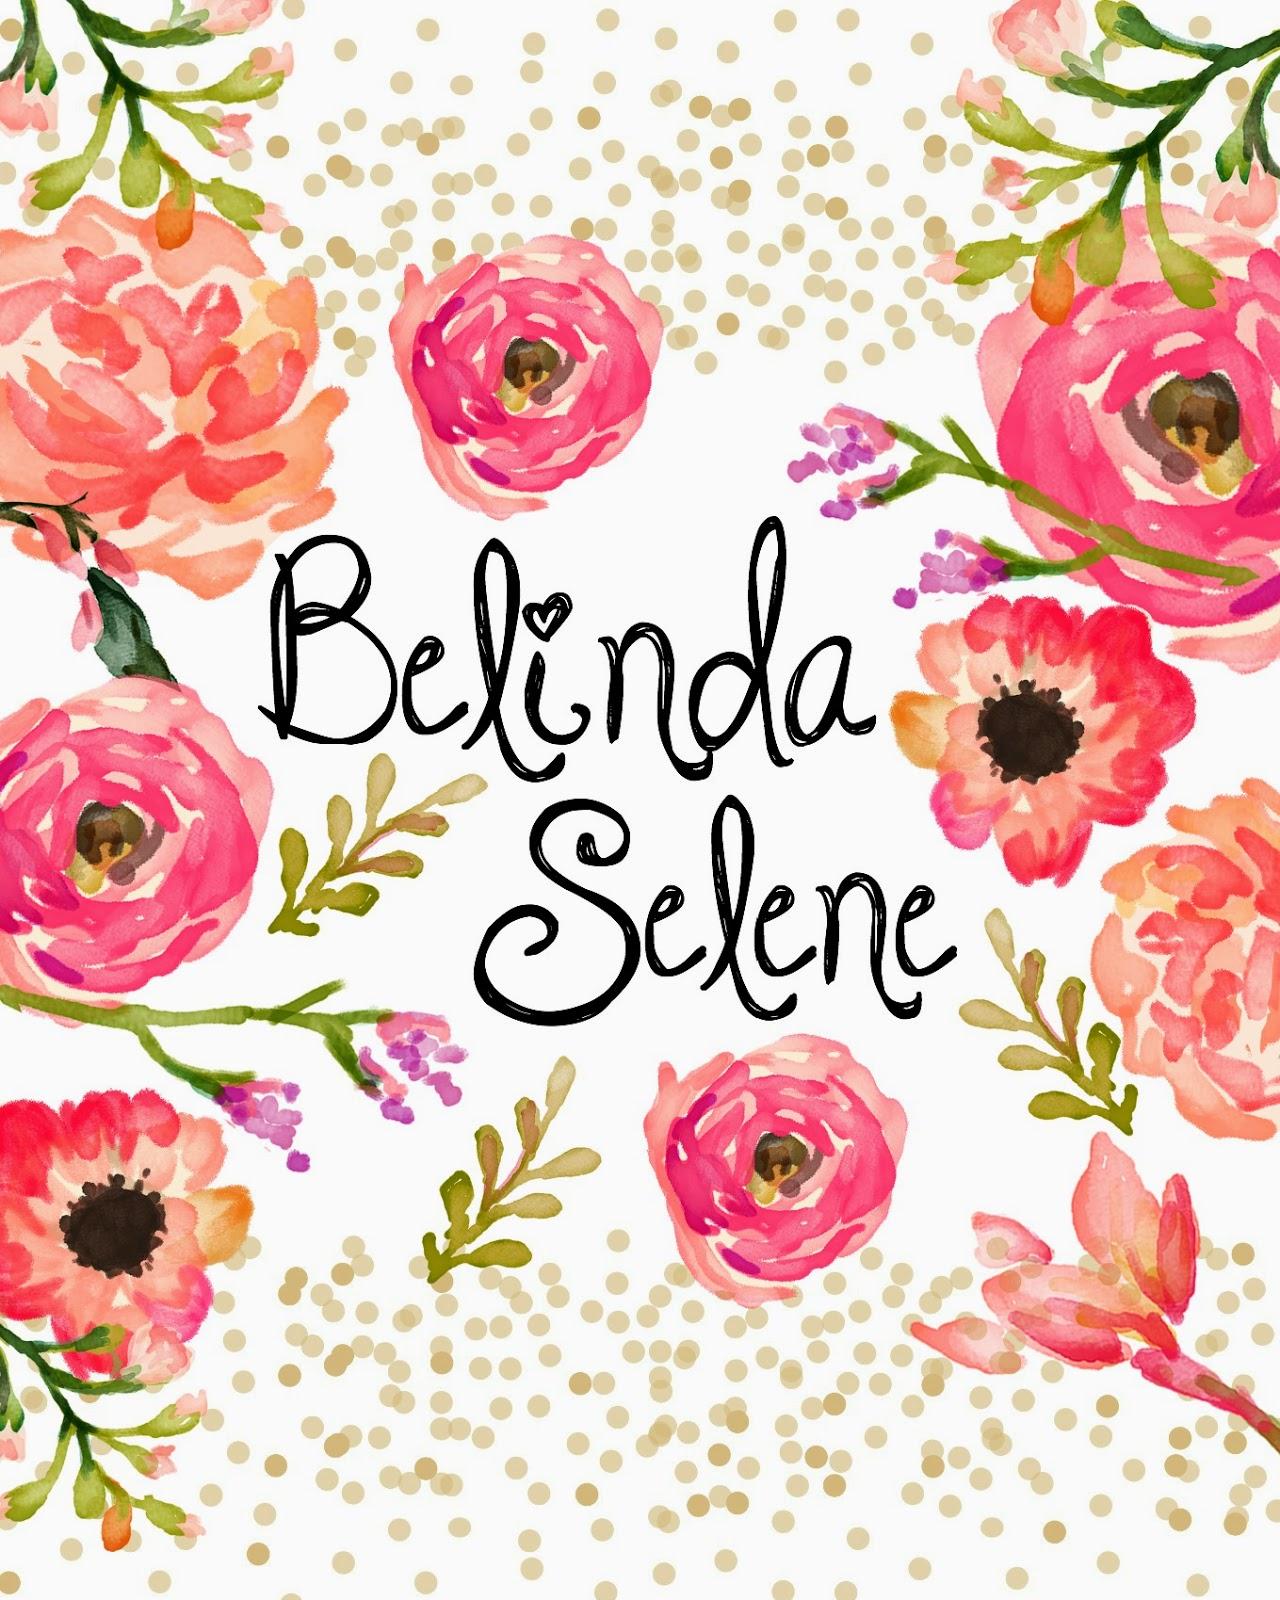 School Book Covers Printable Tumblr : Belindaselene free gorgeous printable covers for erin